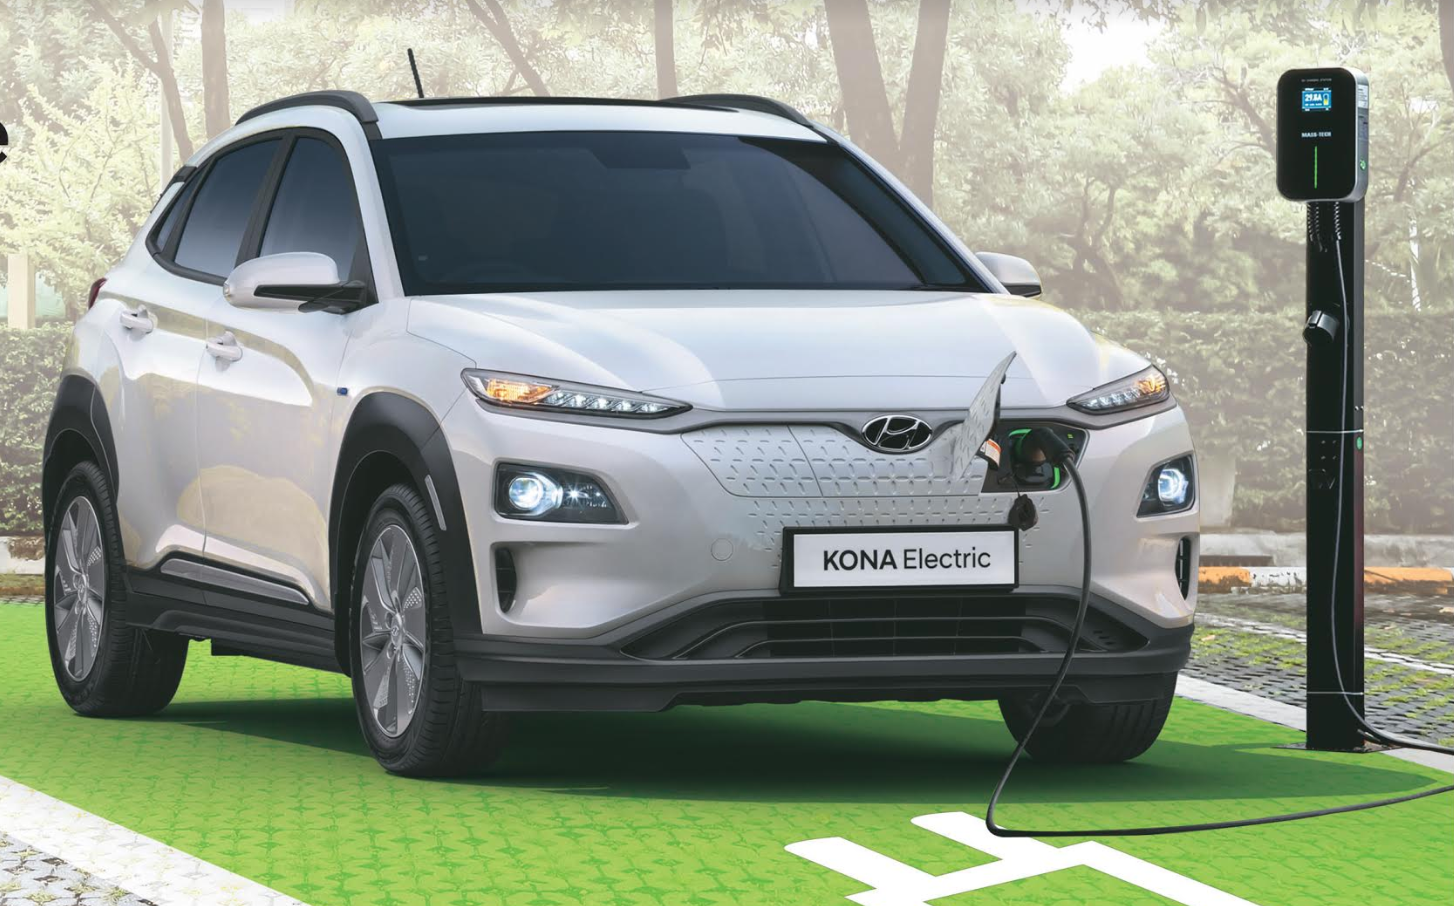 Kona Electric: Hyundai Kona to have 452 KM range in a single charge, Auto News, ET Auto